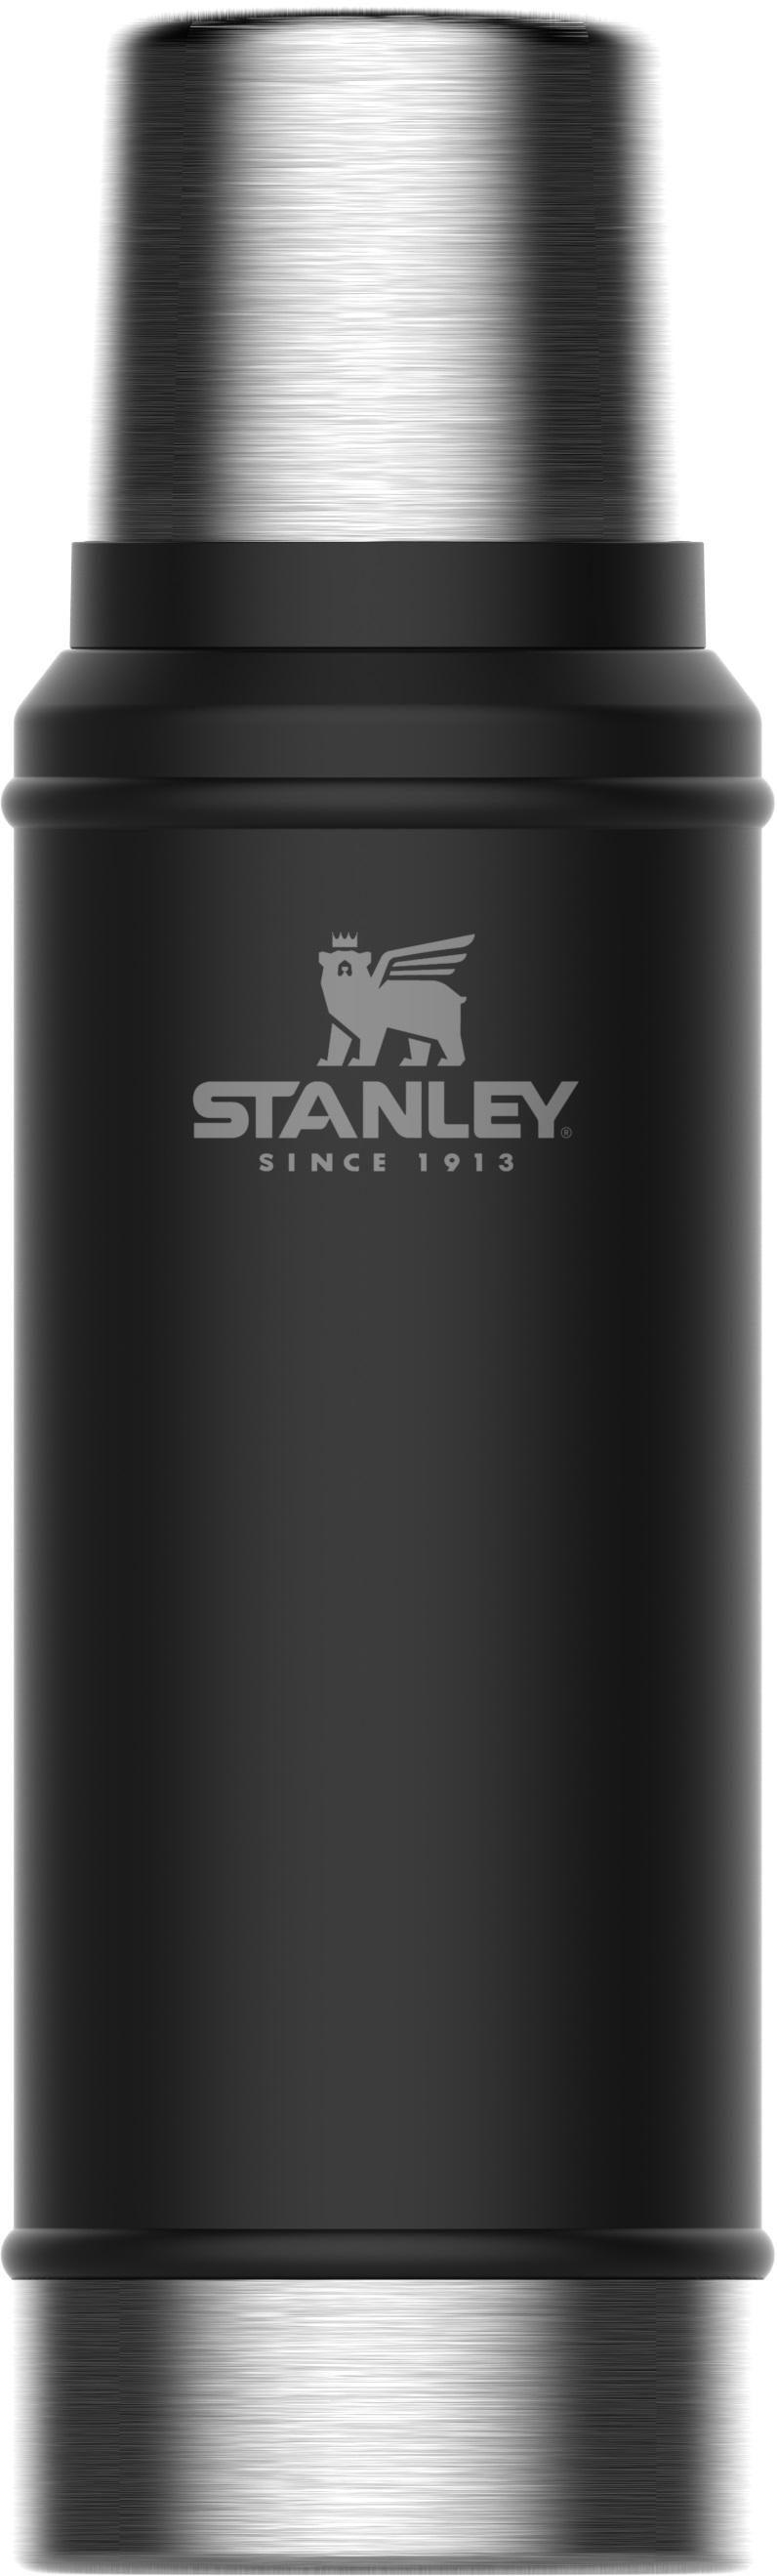 Stanley Termoss Classic 0,75L mateti melns 2801612028 termoss